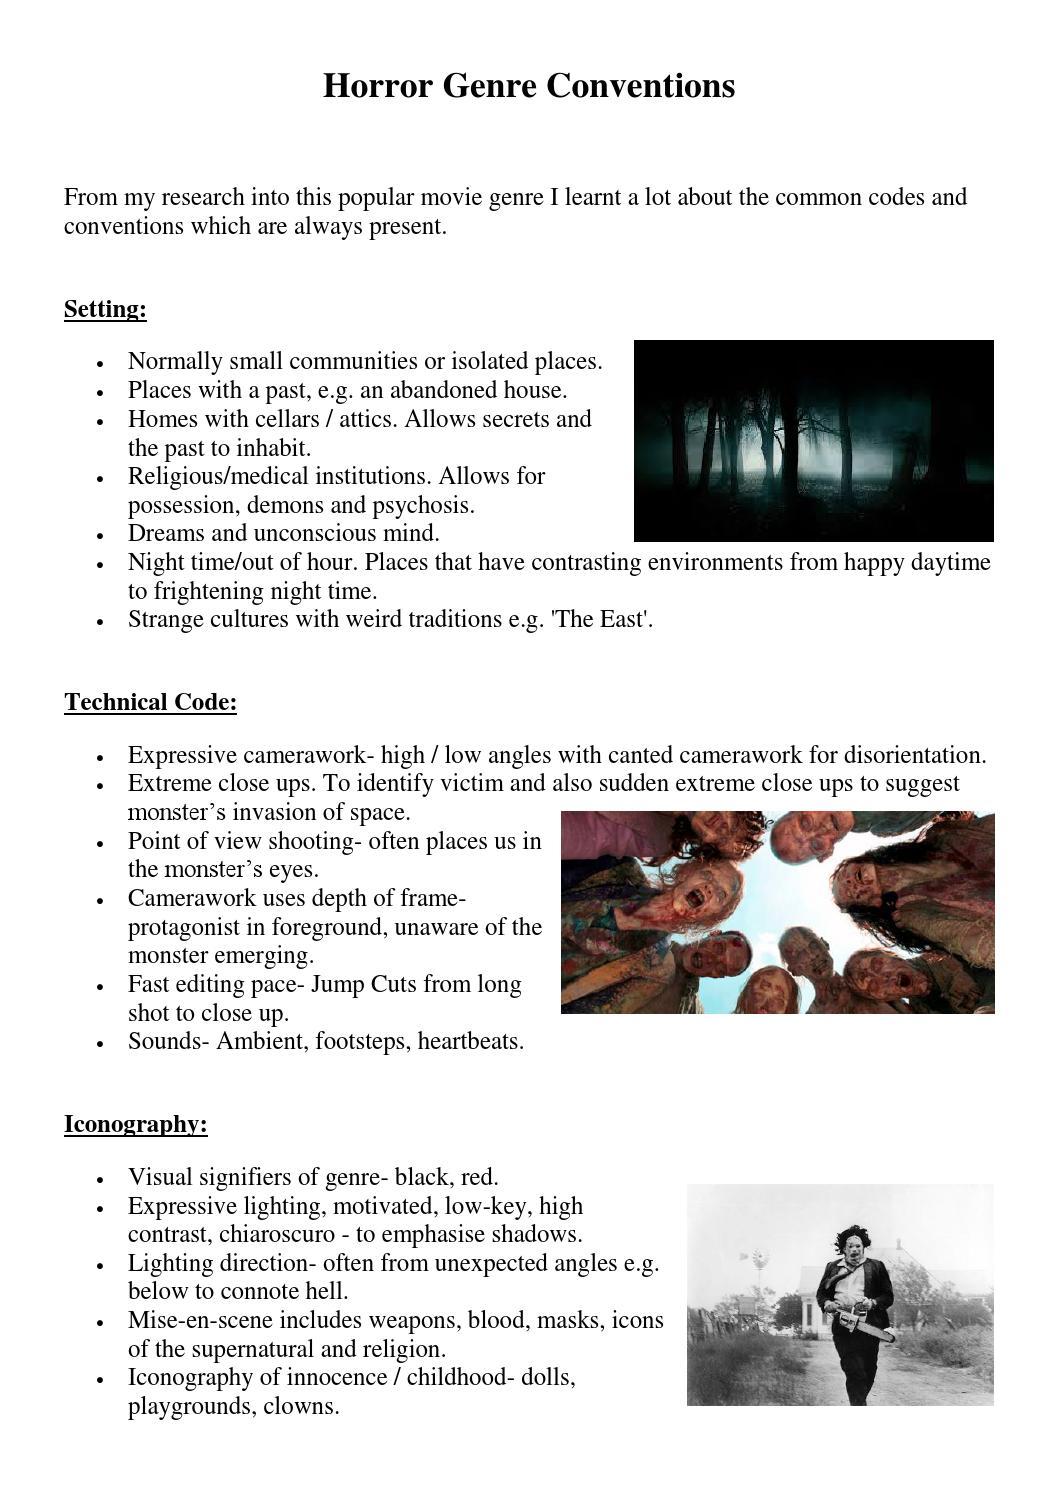 Horror genre conventions by maia brett - issuu